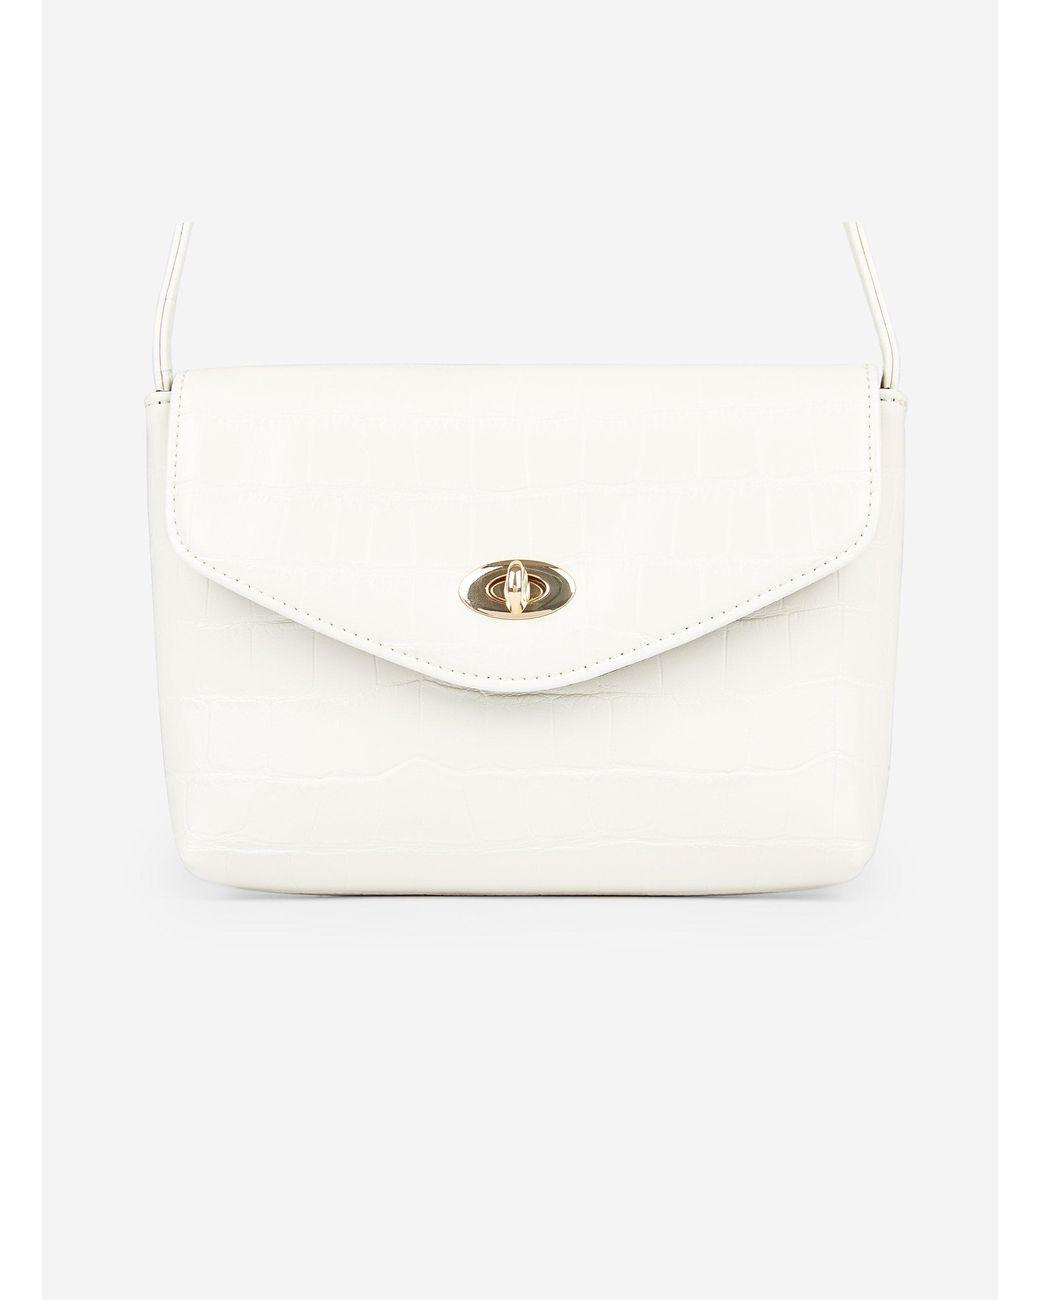 7df41763c44 Dorothy Perkins Cream Crocodile Design Twistlock Cross Body Bag in ...